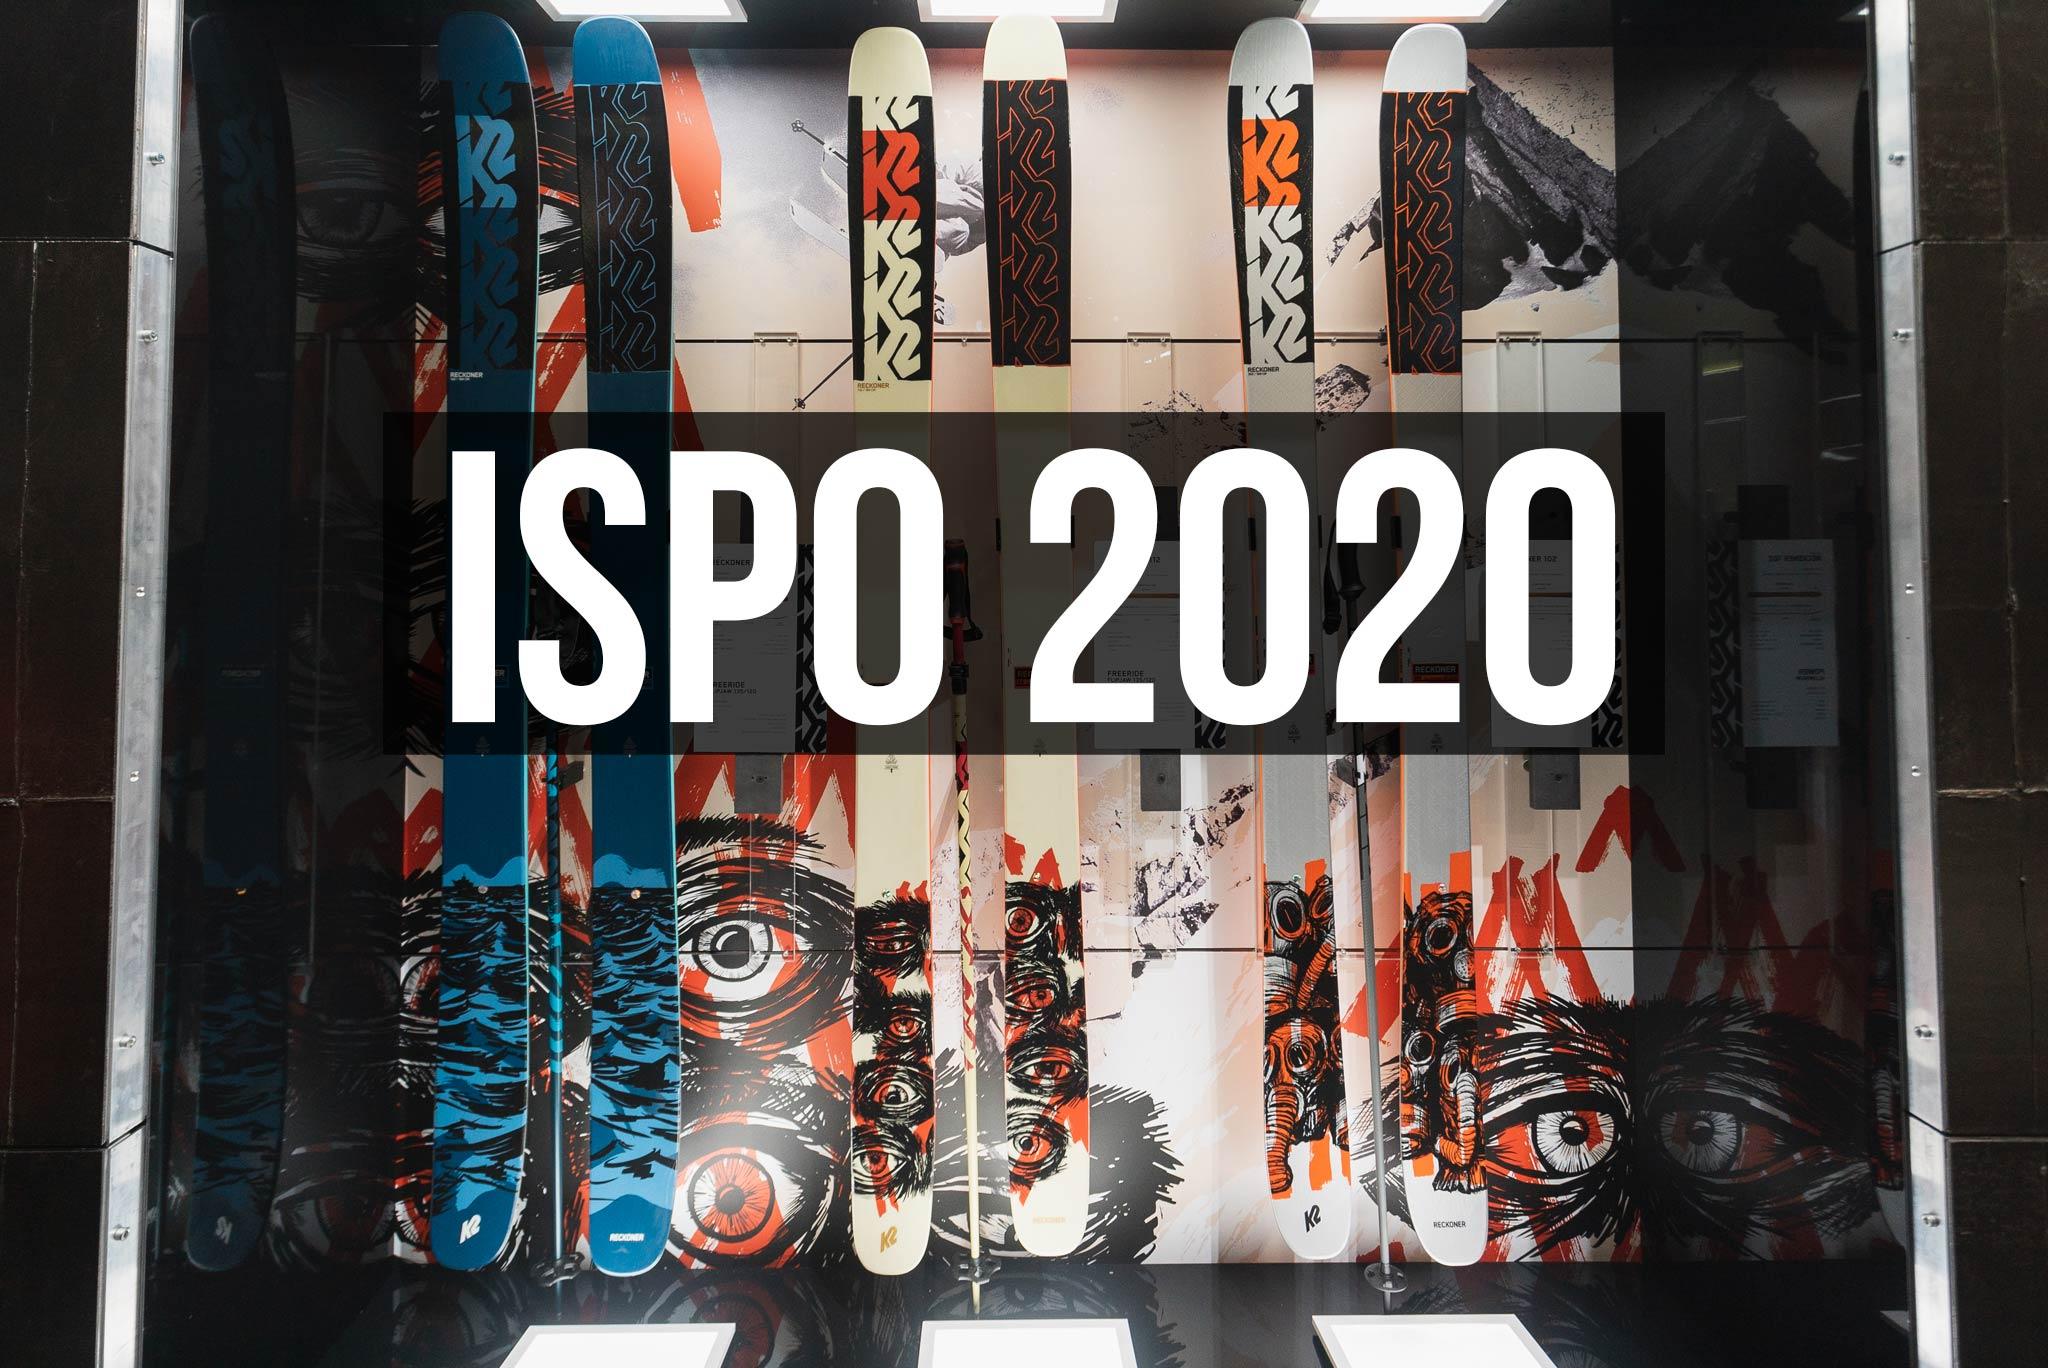 ISPO 2020 – Alle Ski-Neuheiten 2021 von Blizzard, K2, Line Skis, Völkl & Co.